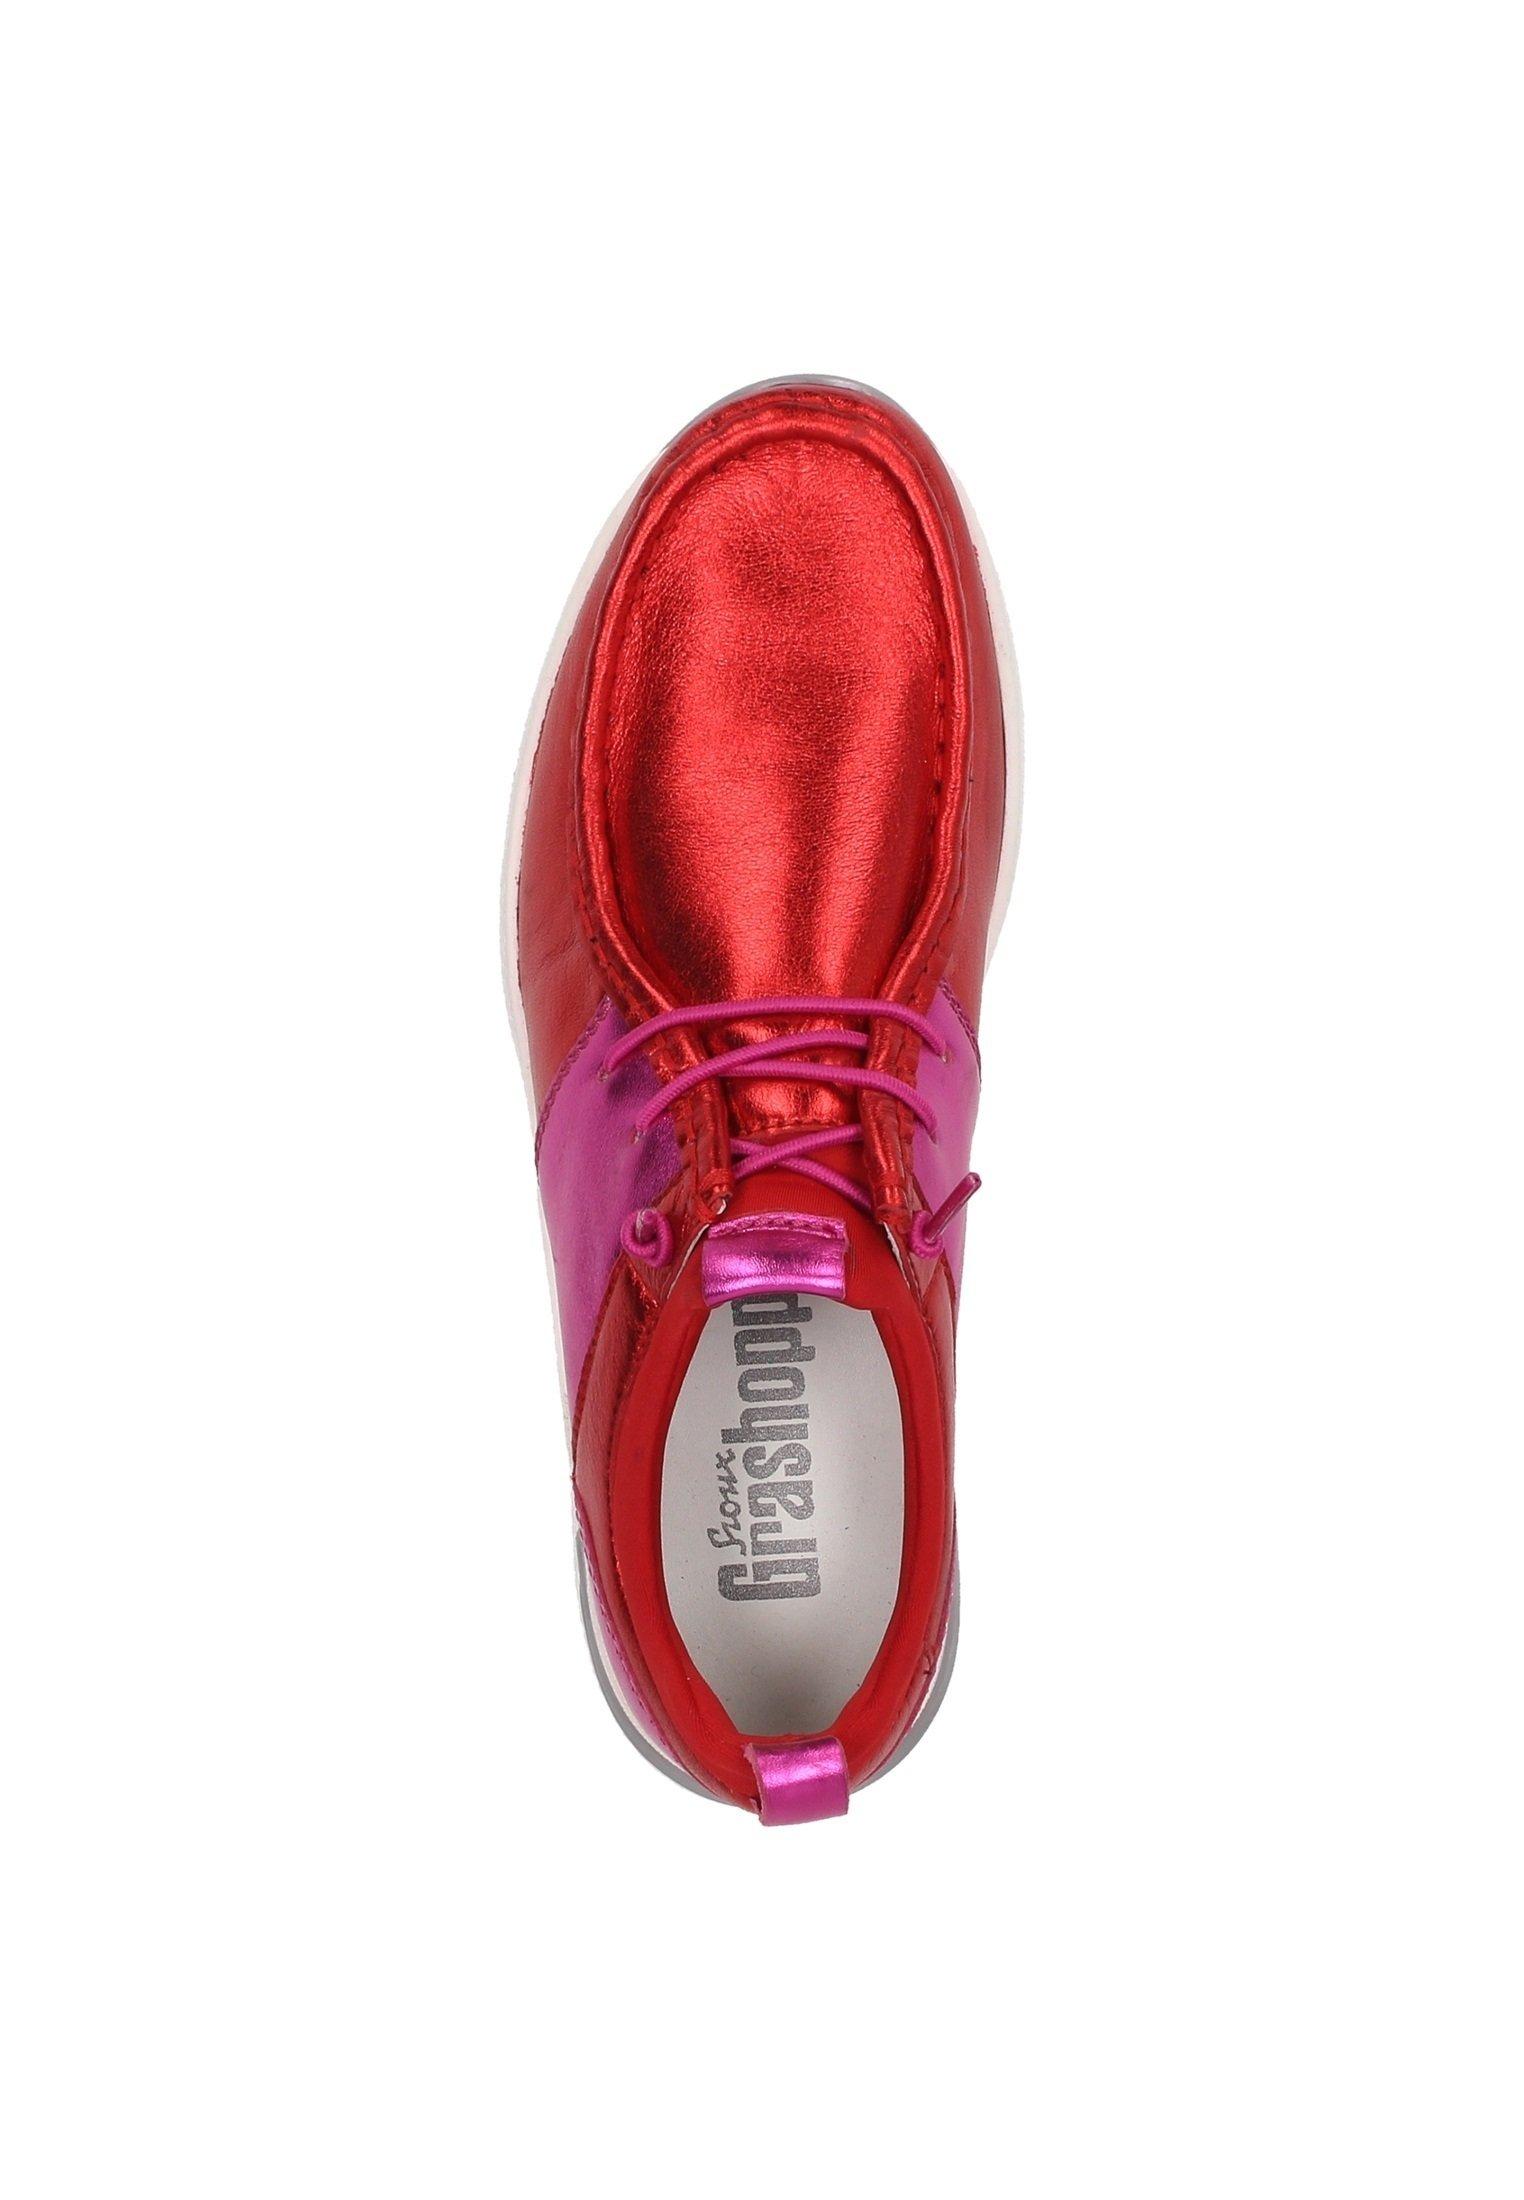 Sioux Sneaker low - red IVYHgj